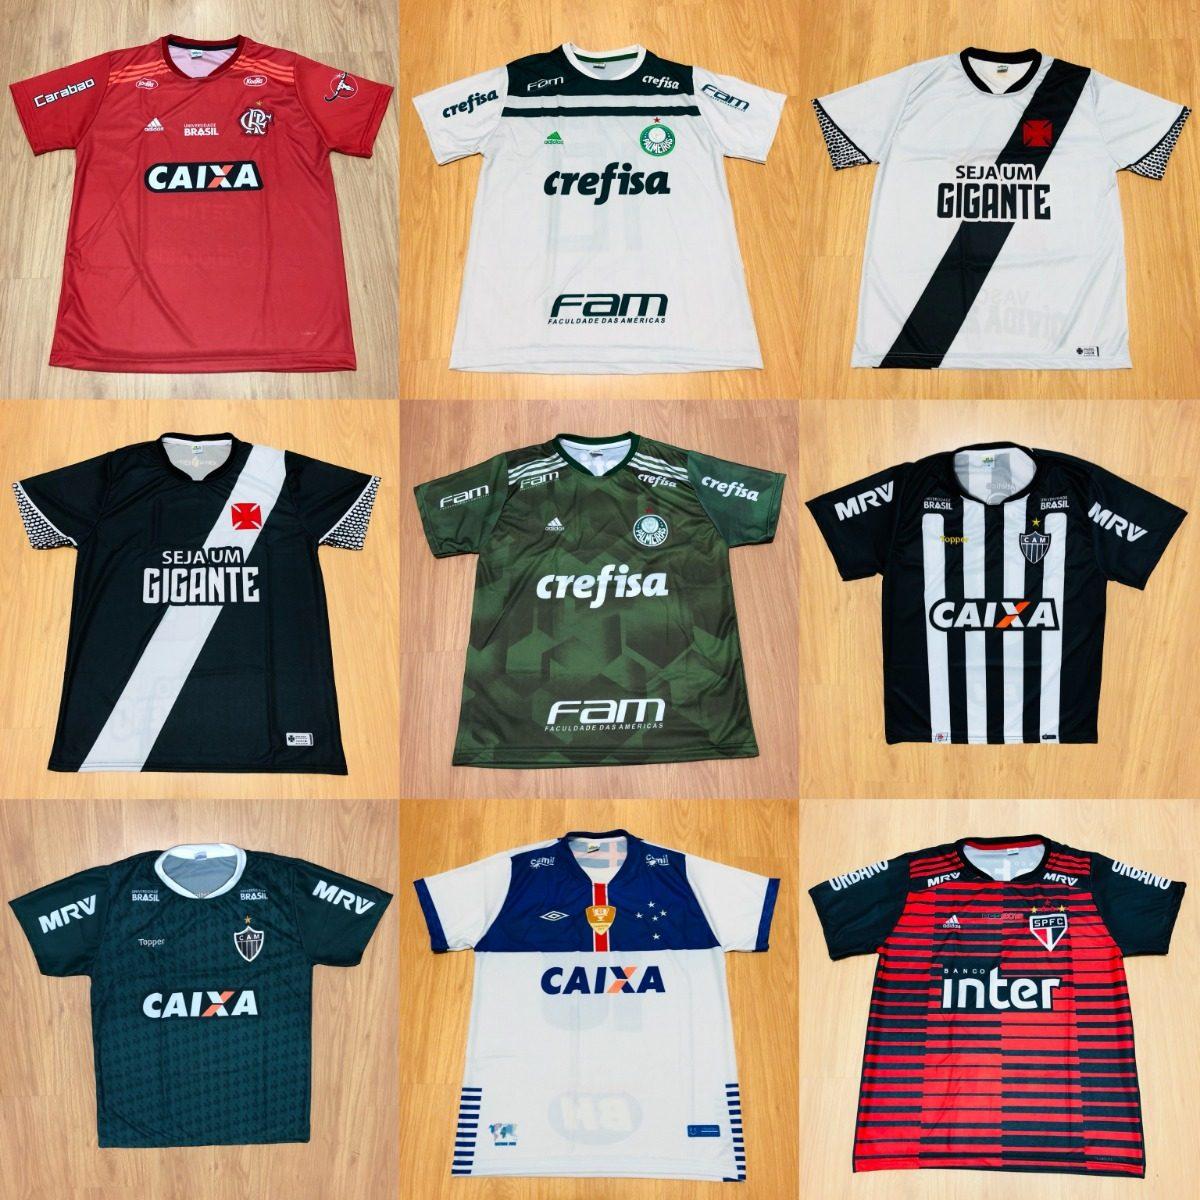 10 Camisetas De Time Atacado Futebol 100 Modelos Barato 2018 - R ... df34ab5430953